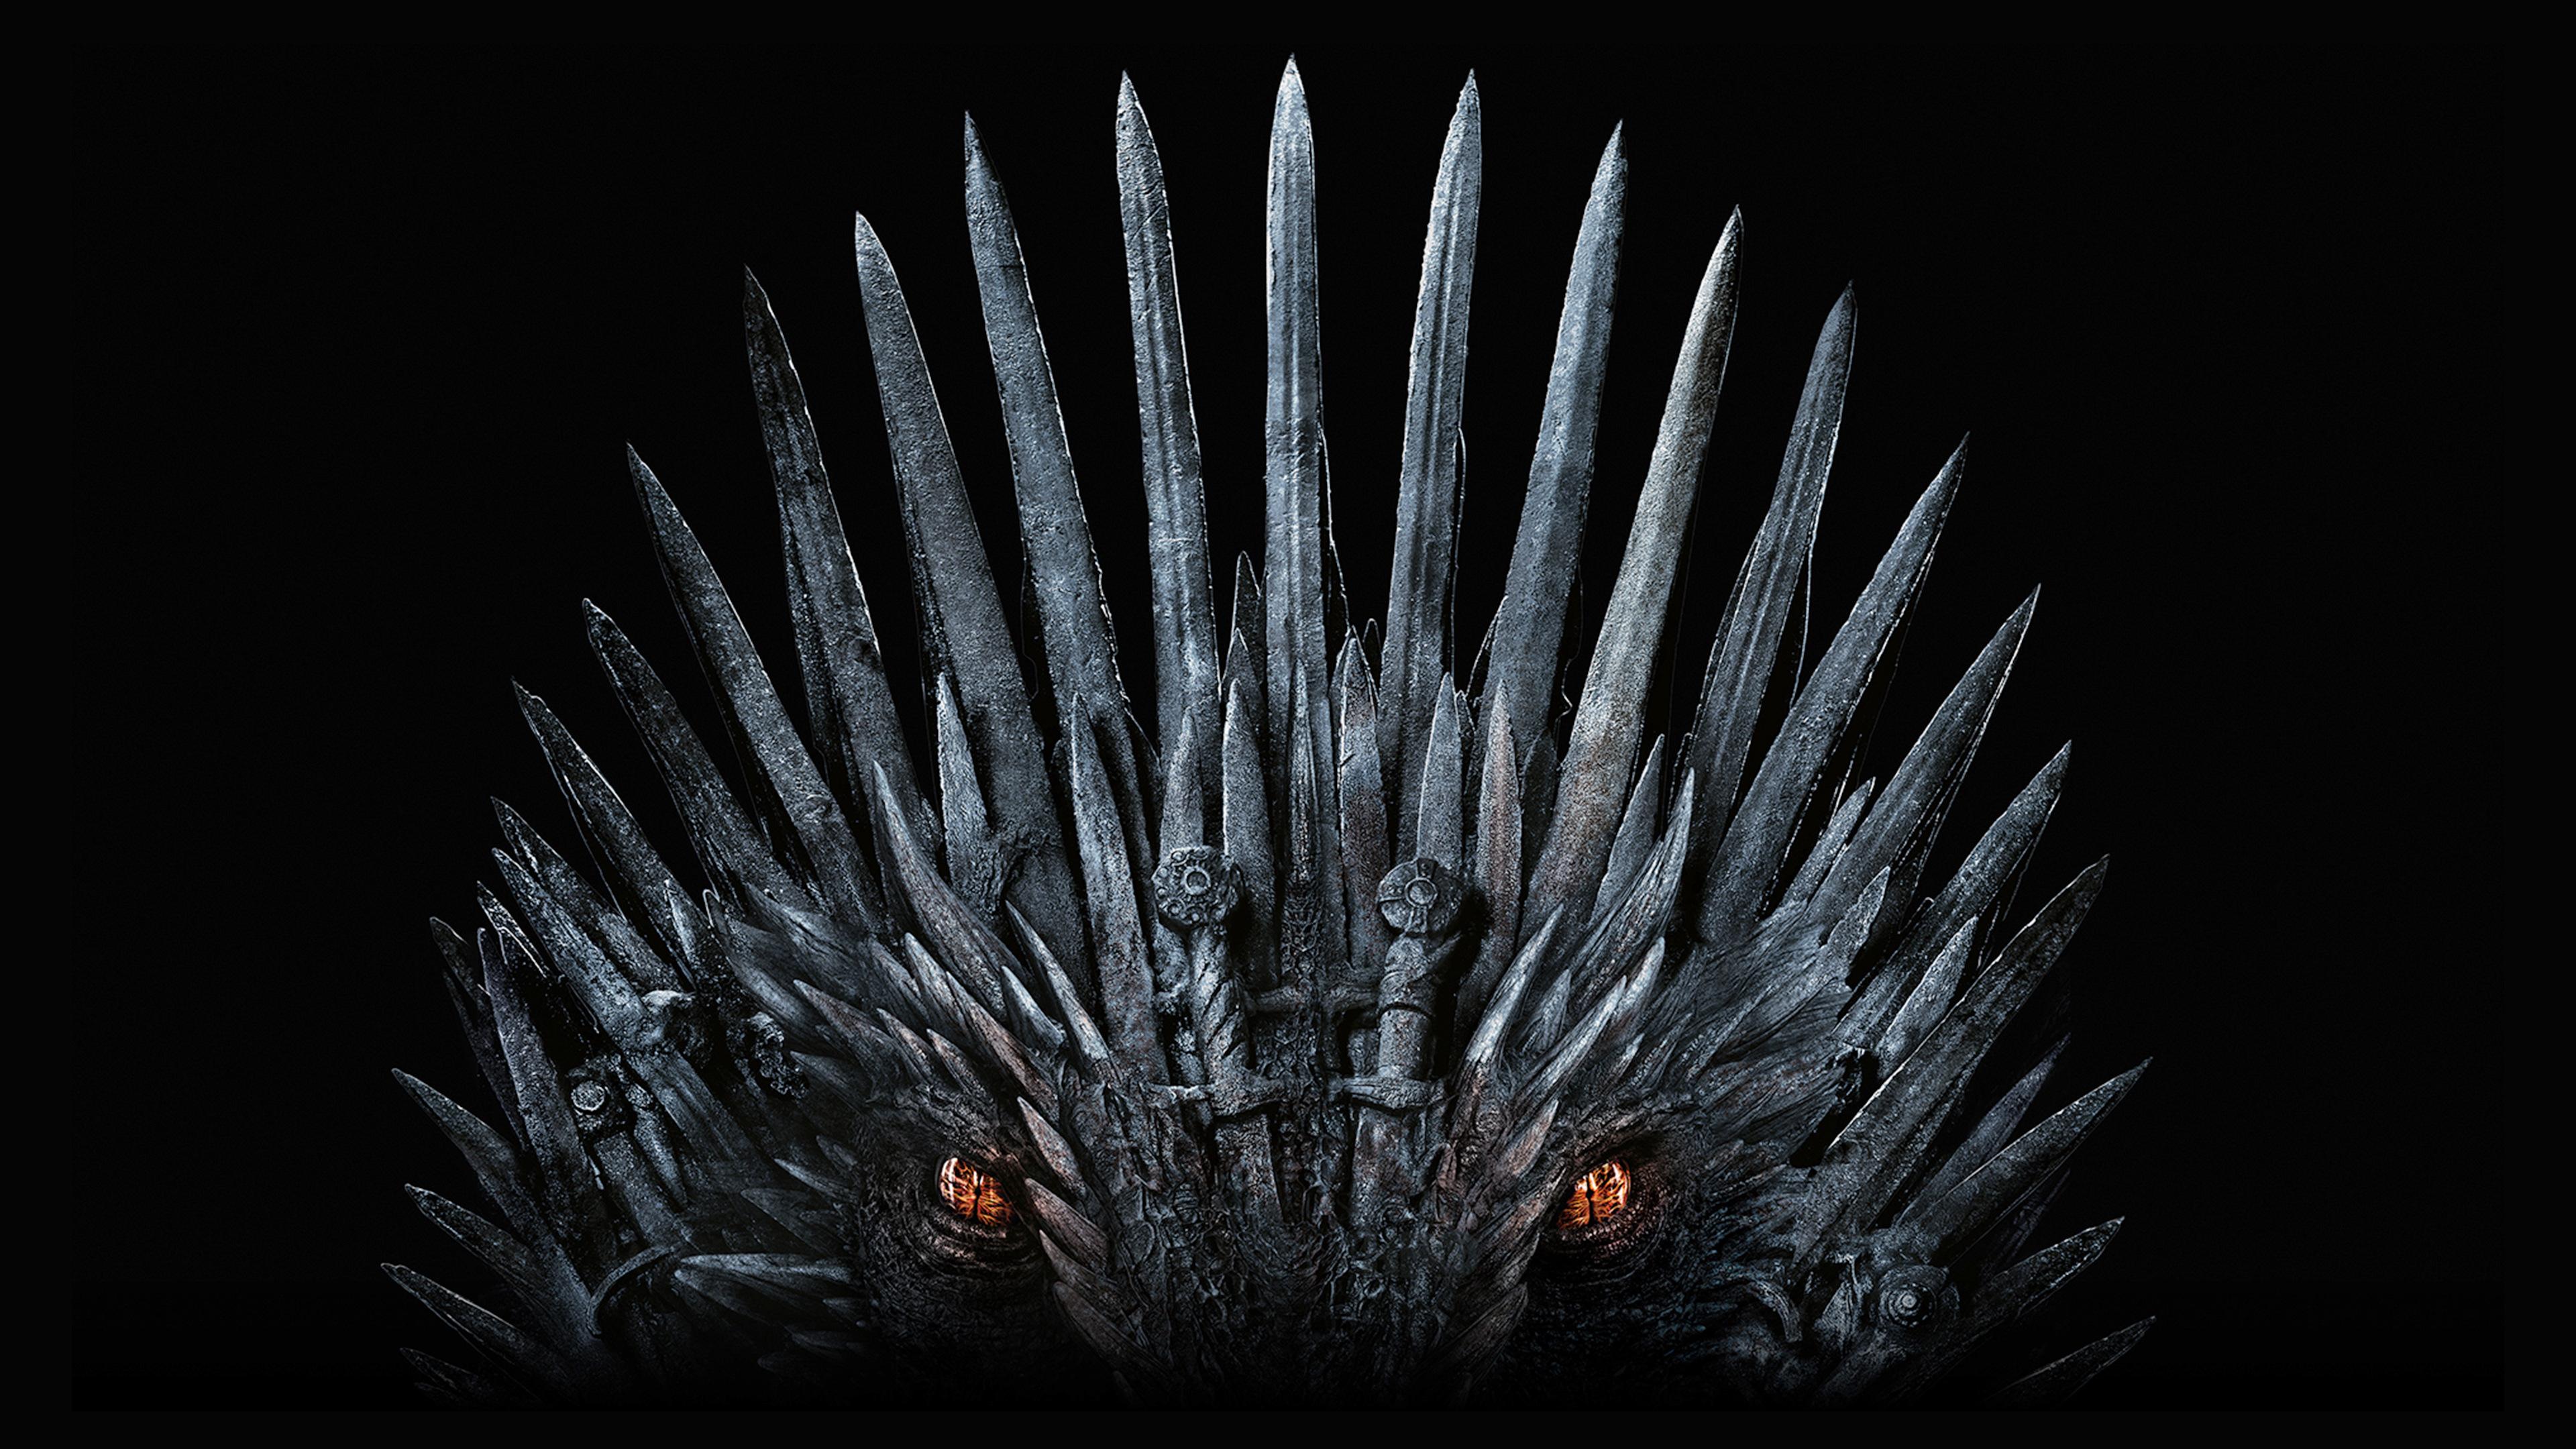 Hd Galaxy S7 Wallpaper Game Of Thrones Iron Throne 4k 75 Wallpaper